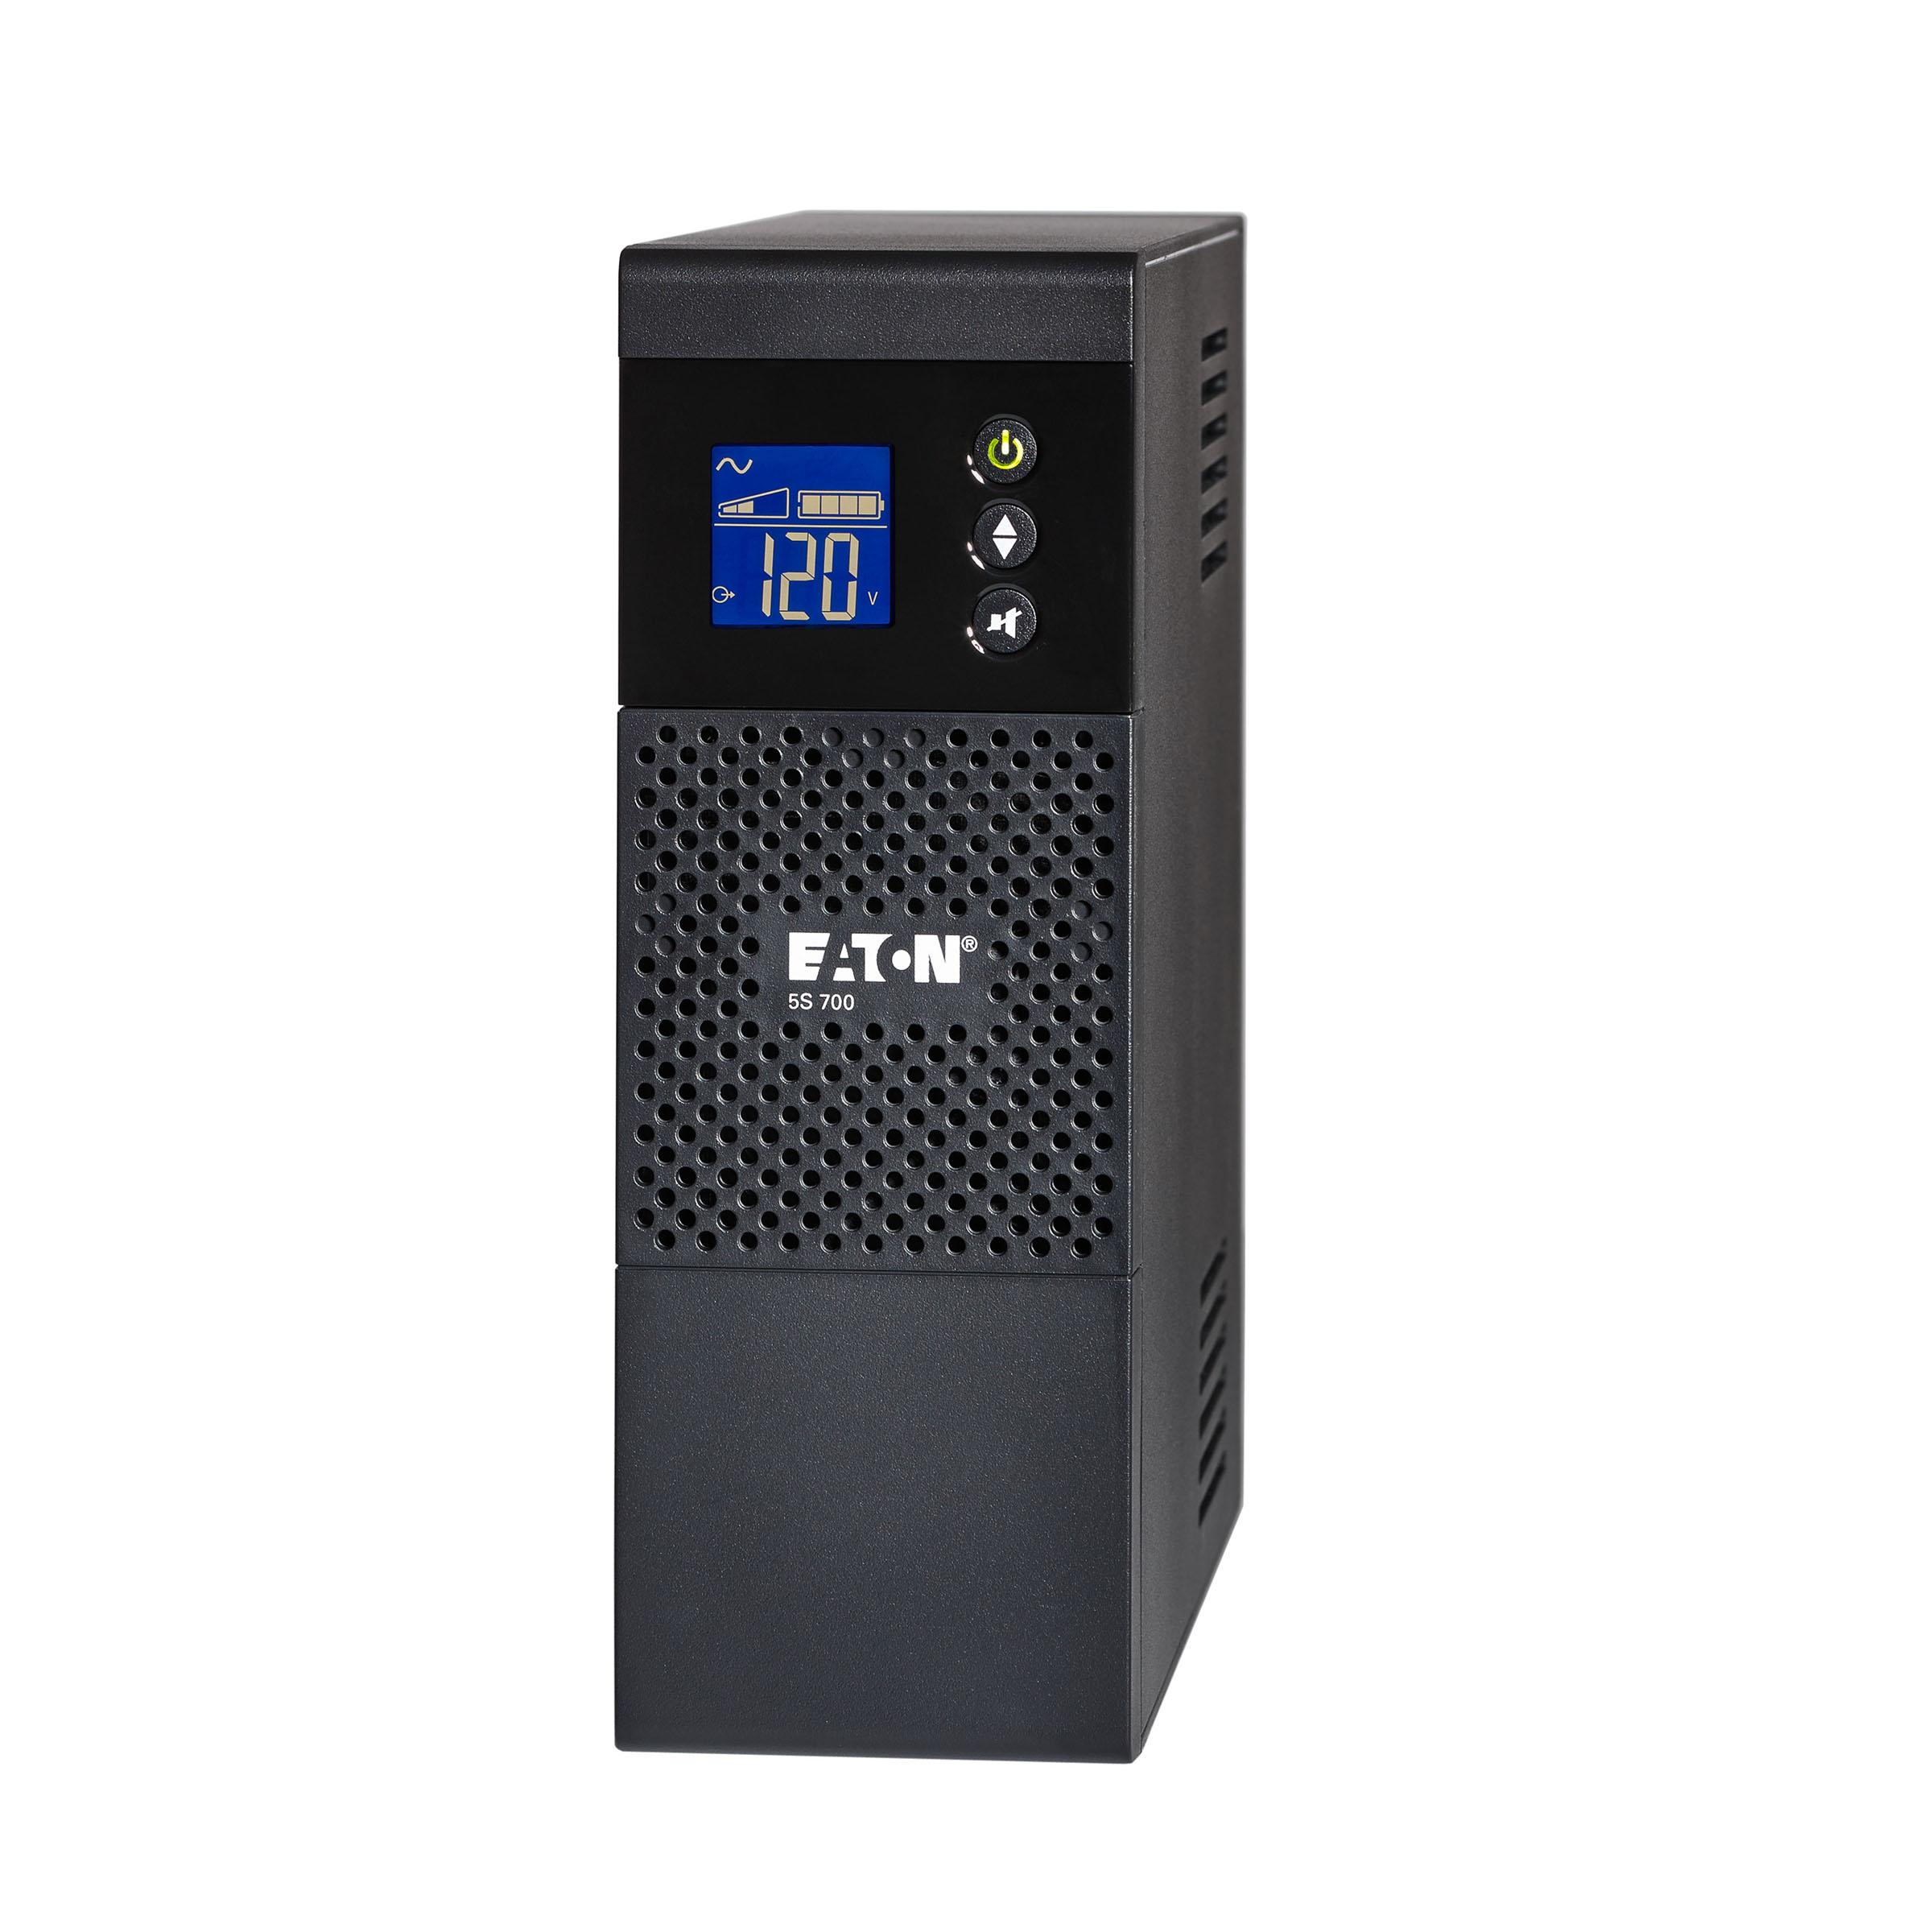 EATN 5S1500LCD UPS TOWER 1500/900W 5-15R